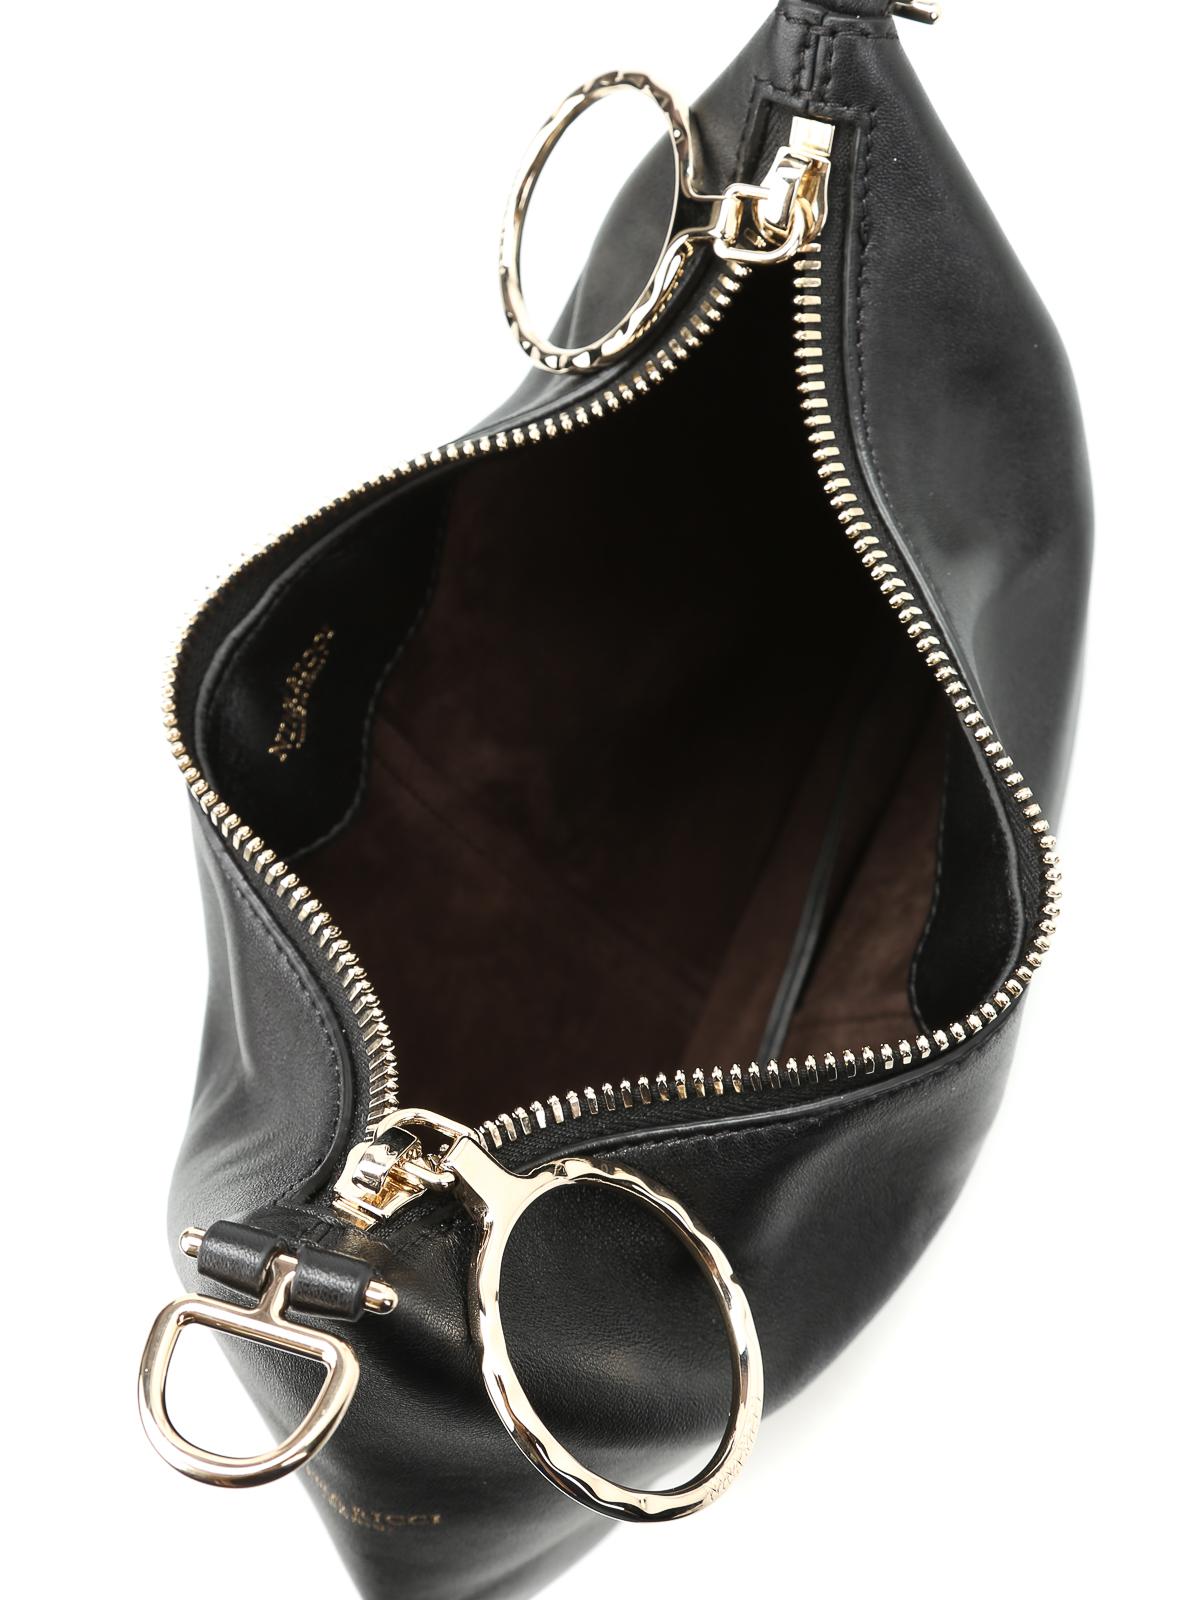 80acbf908c Nina Ricci - Kuti wrist strap leather small bag - clutches ...